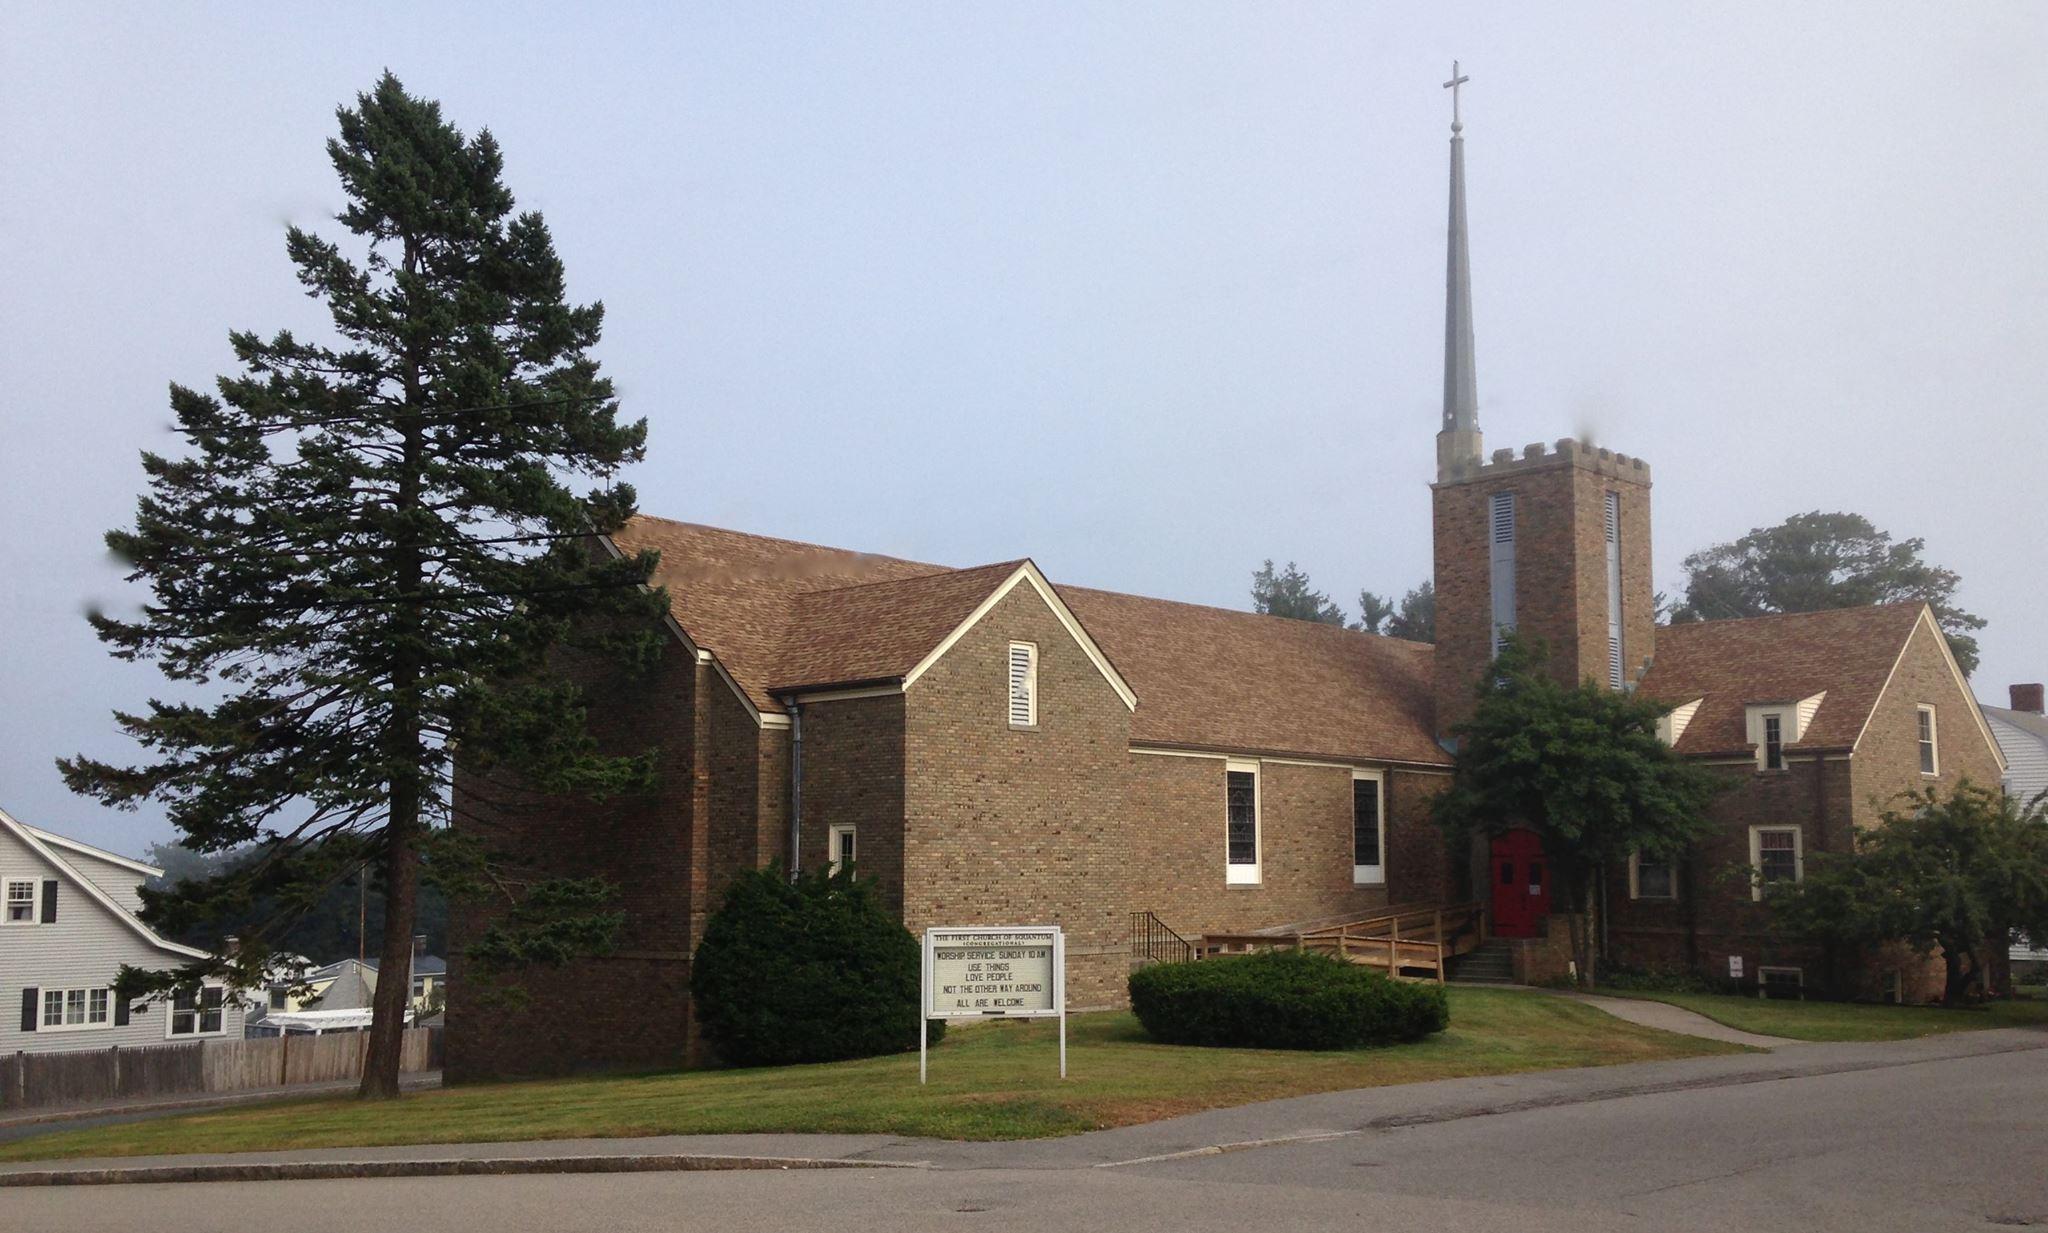 First Church of Squantum